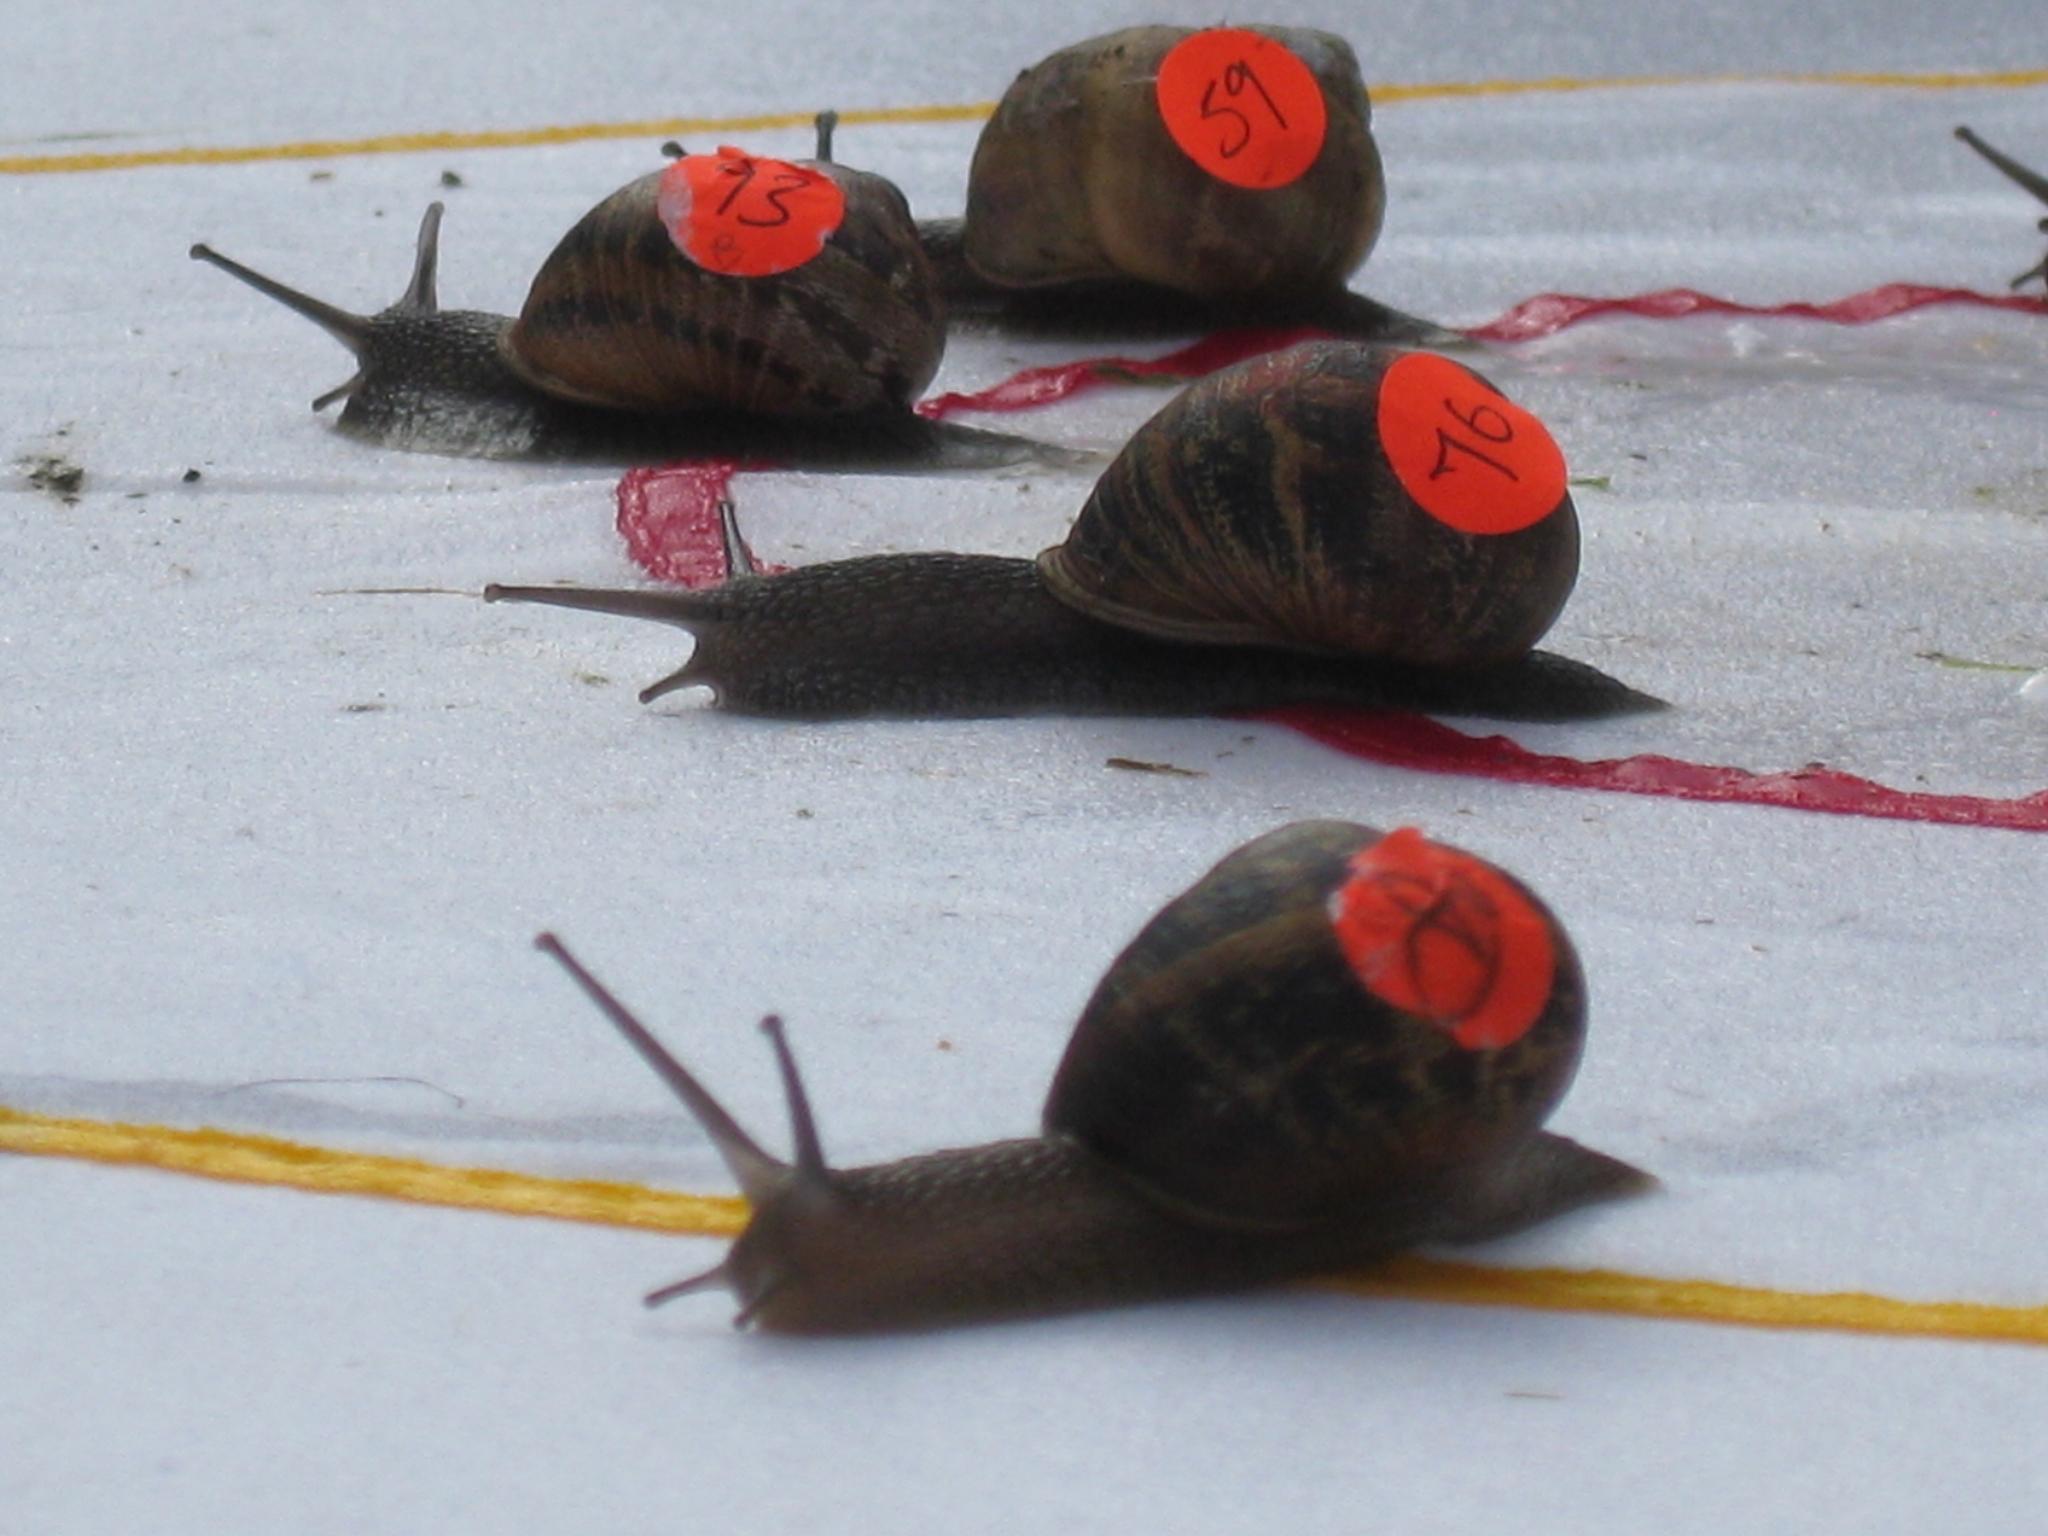 17 reasons to visit Norfolk, World Snail Racing